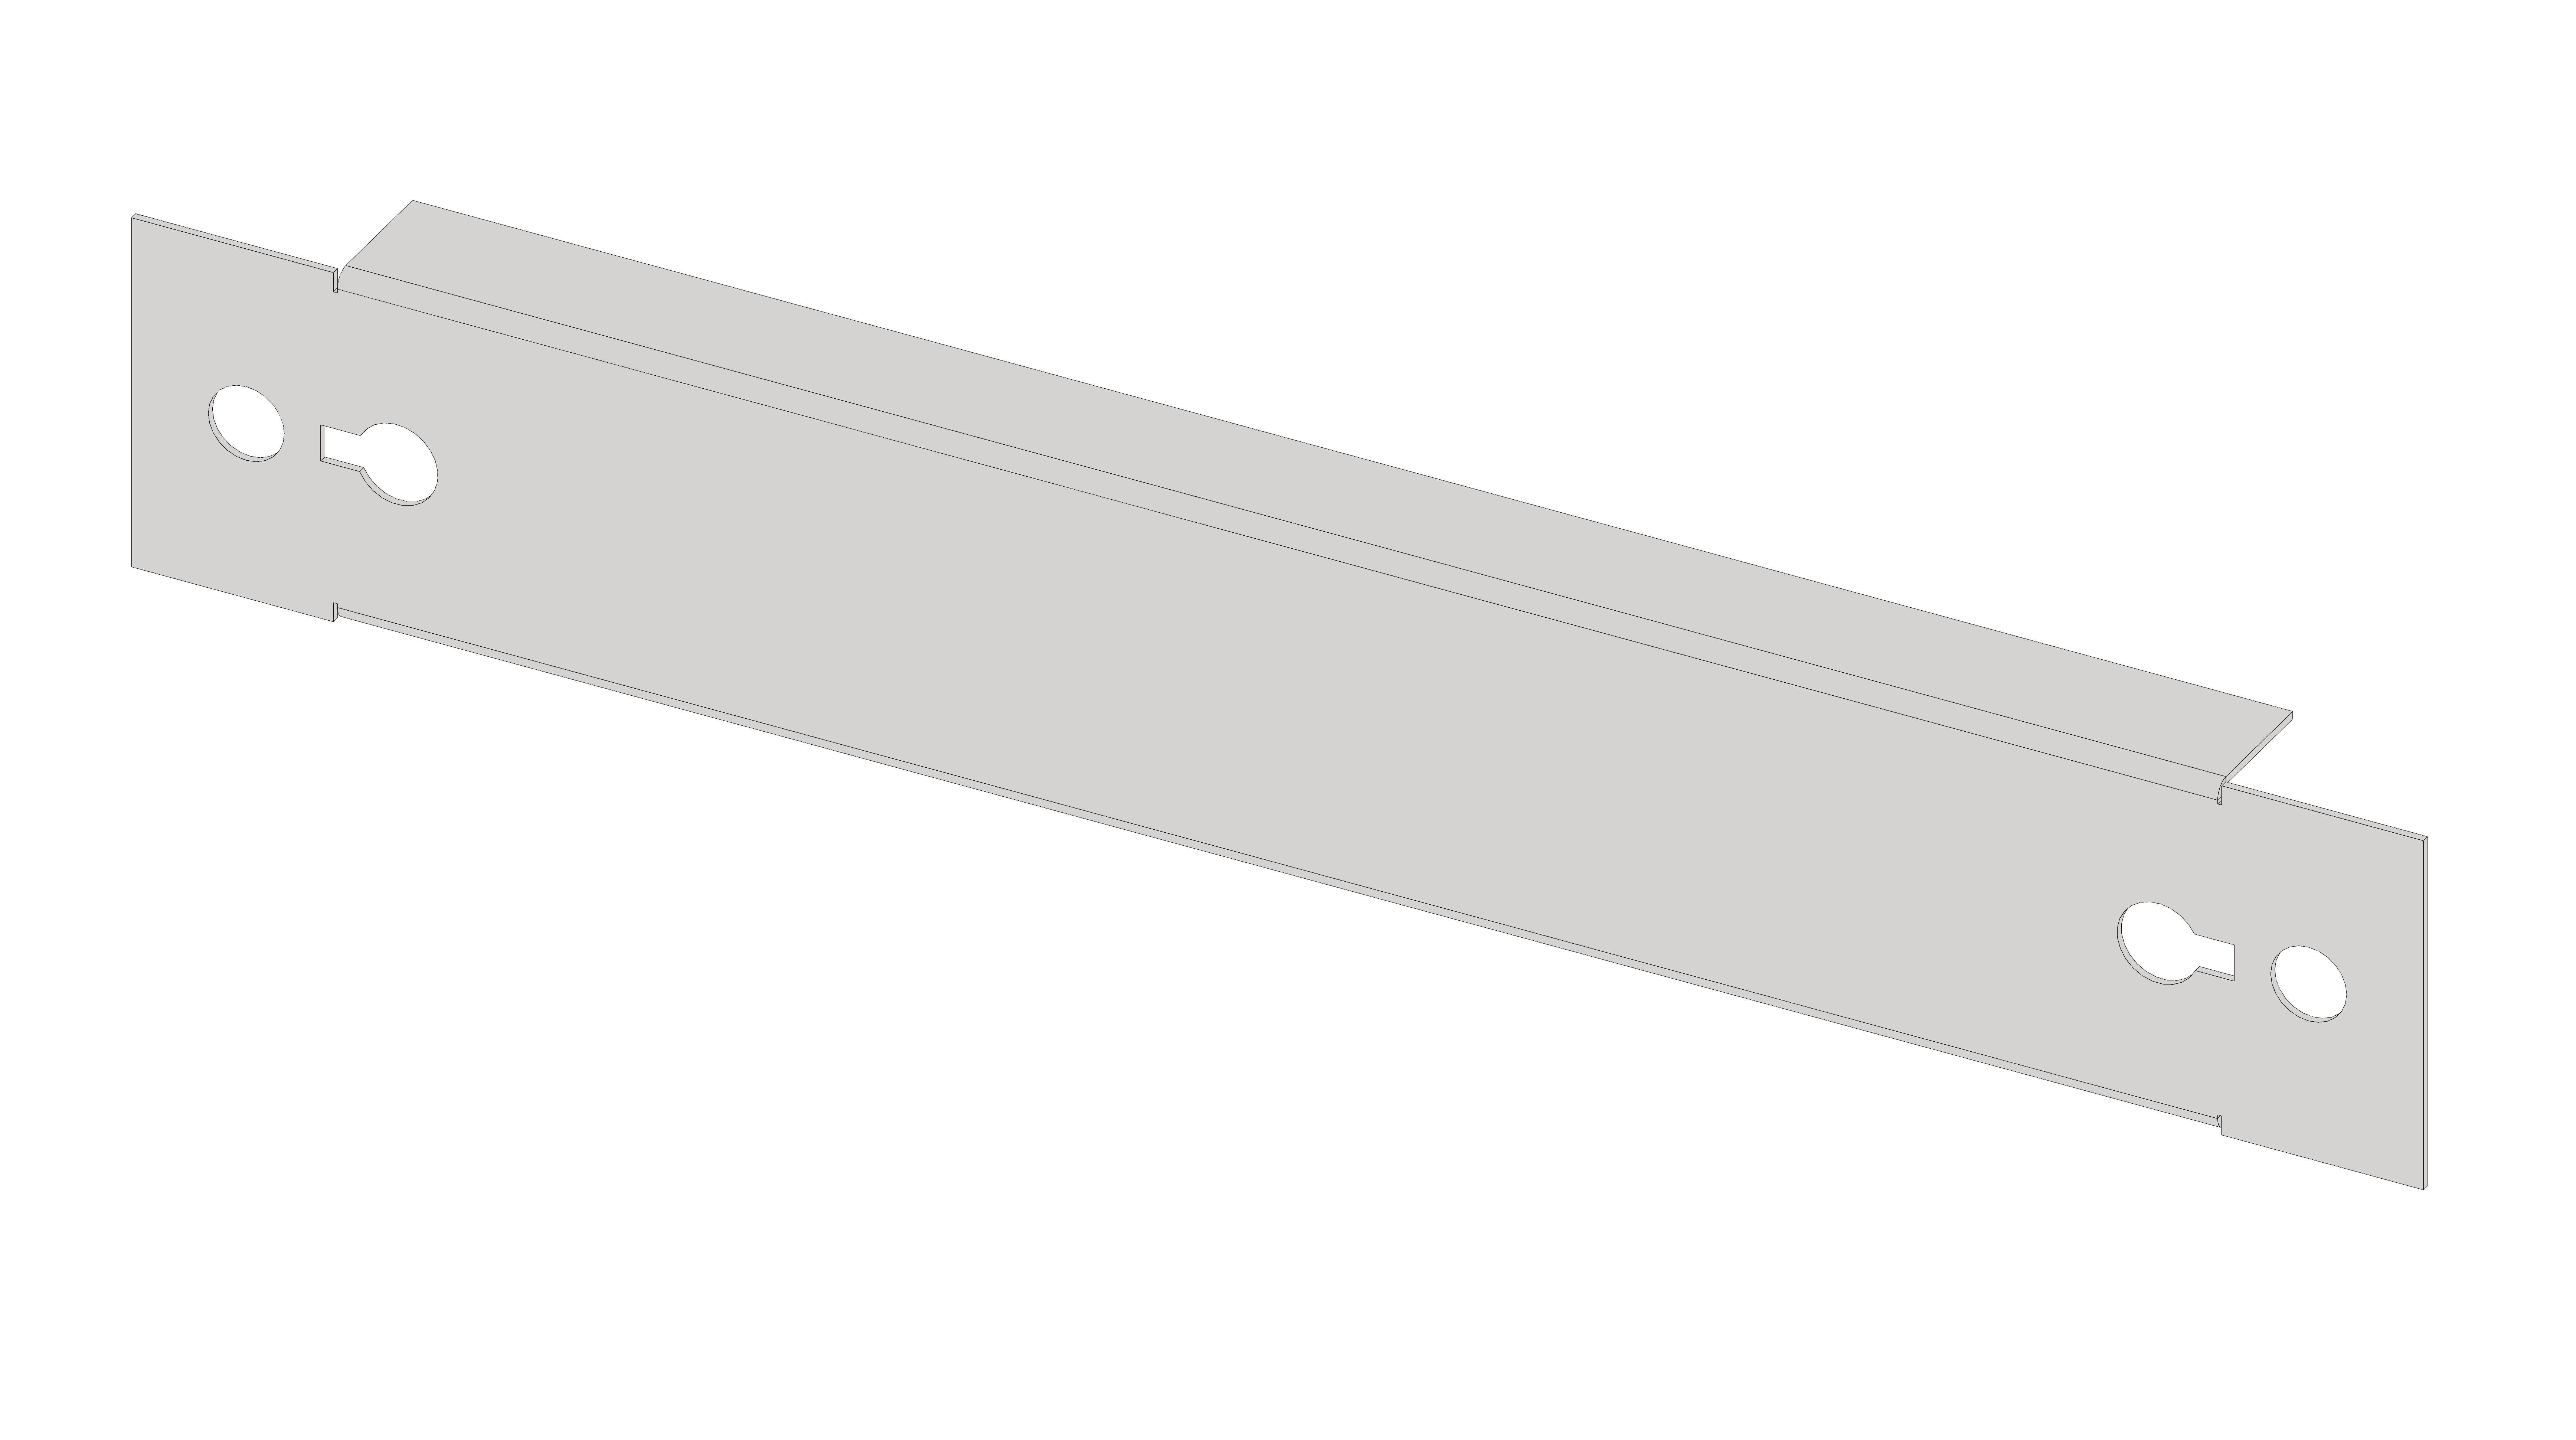 1 Stk Blindfrontplatte 1B1 Stahlblech IL056101-H